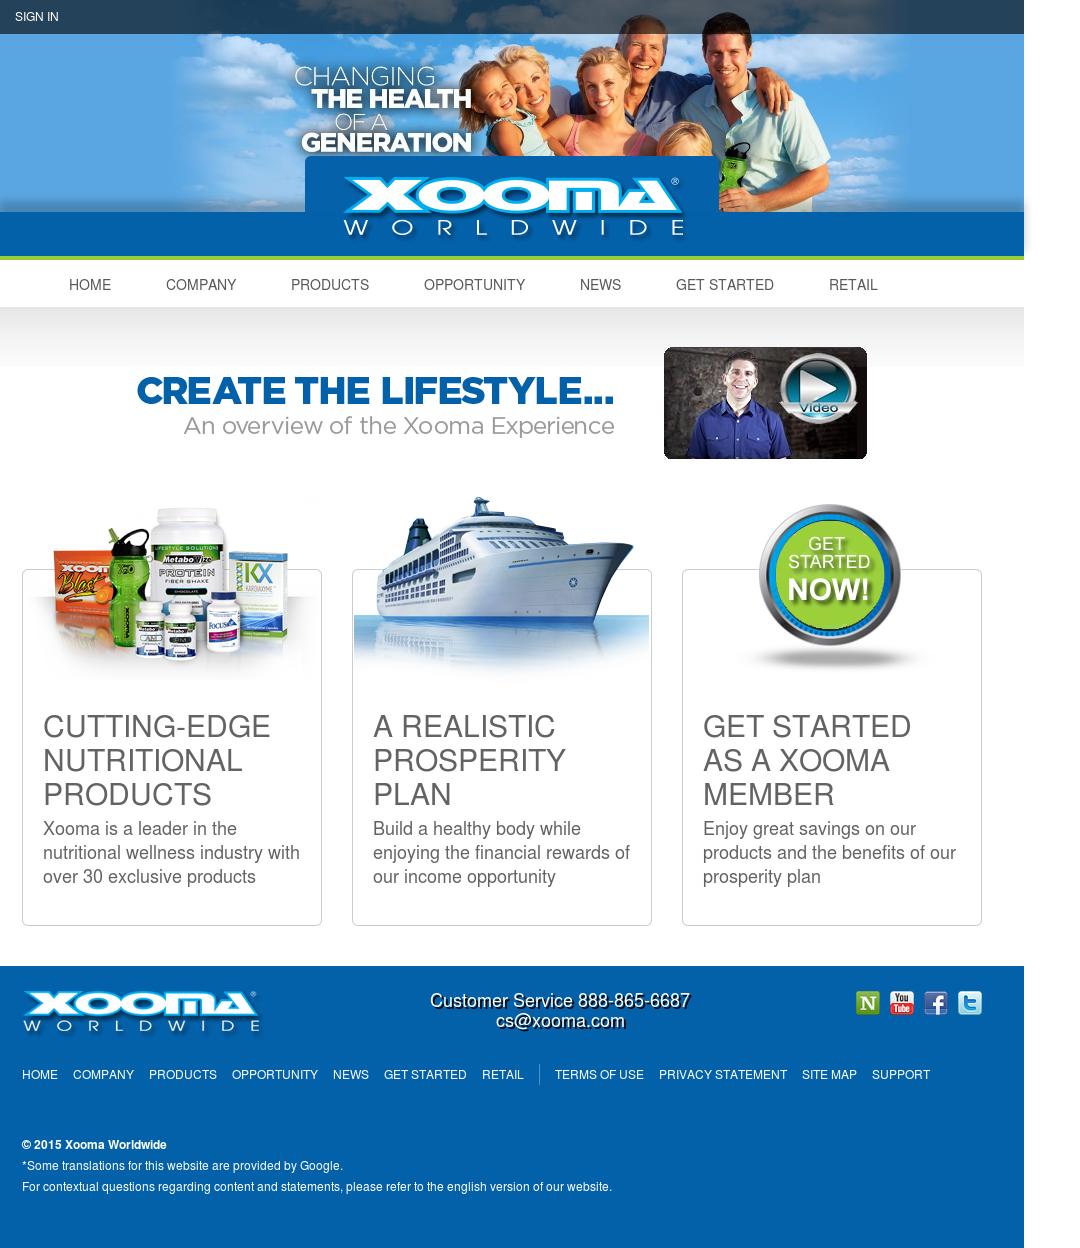 Xooma worldwide address